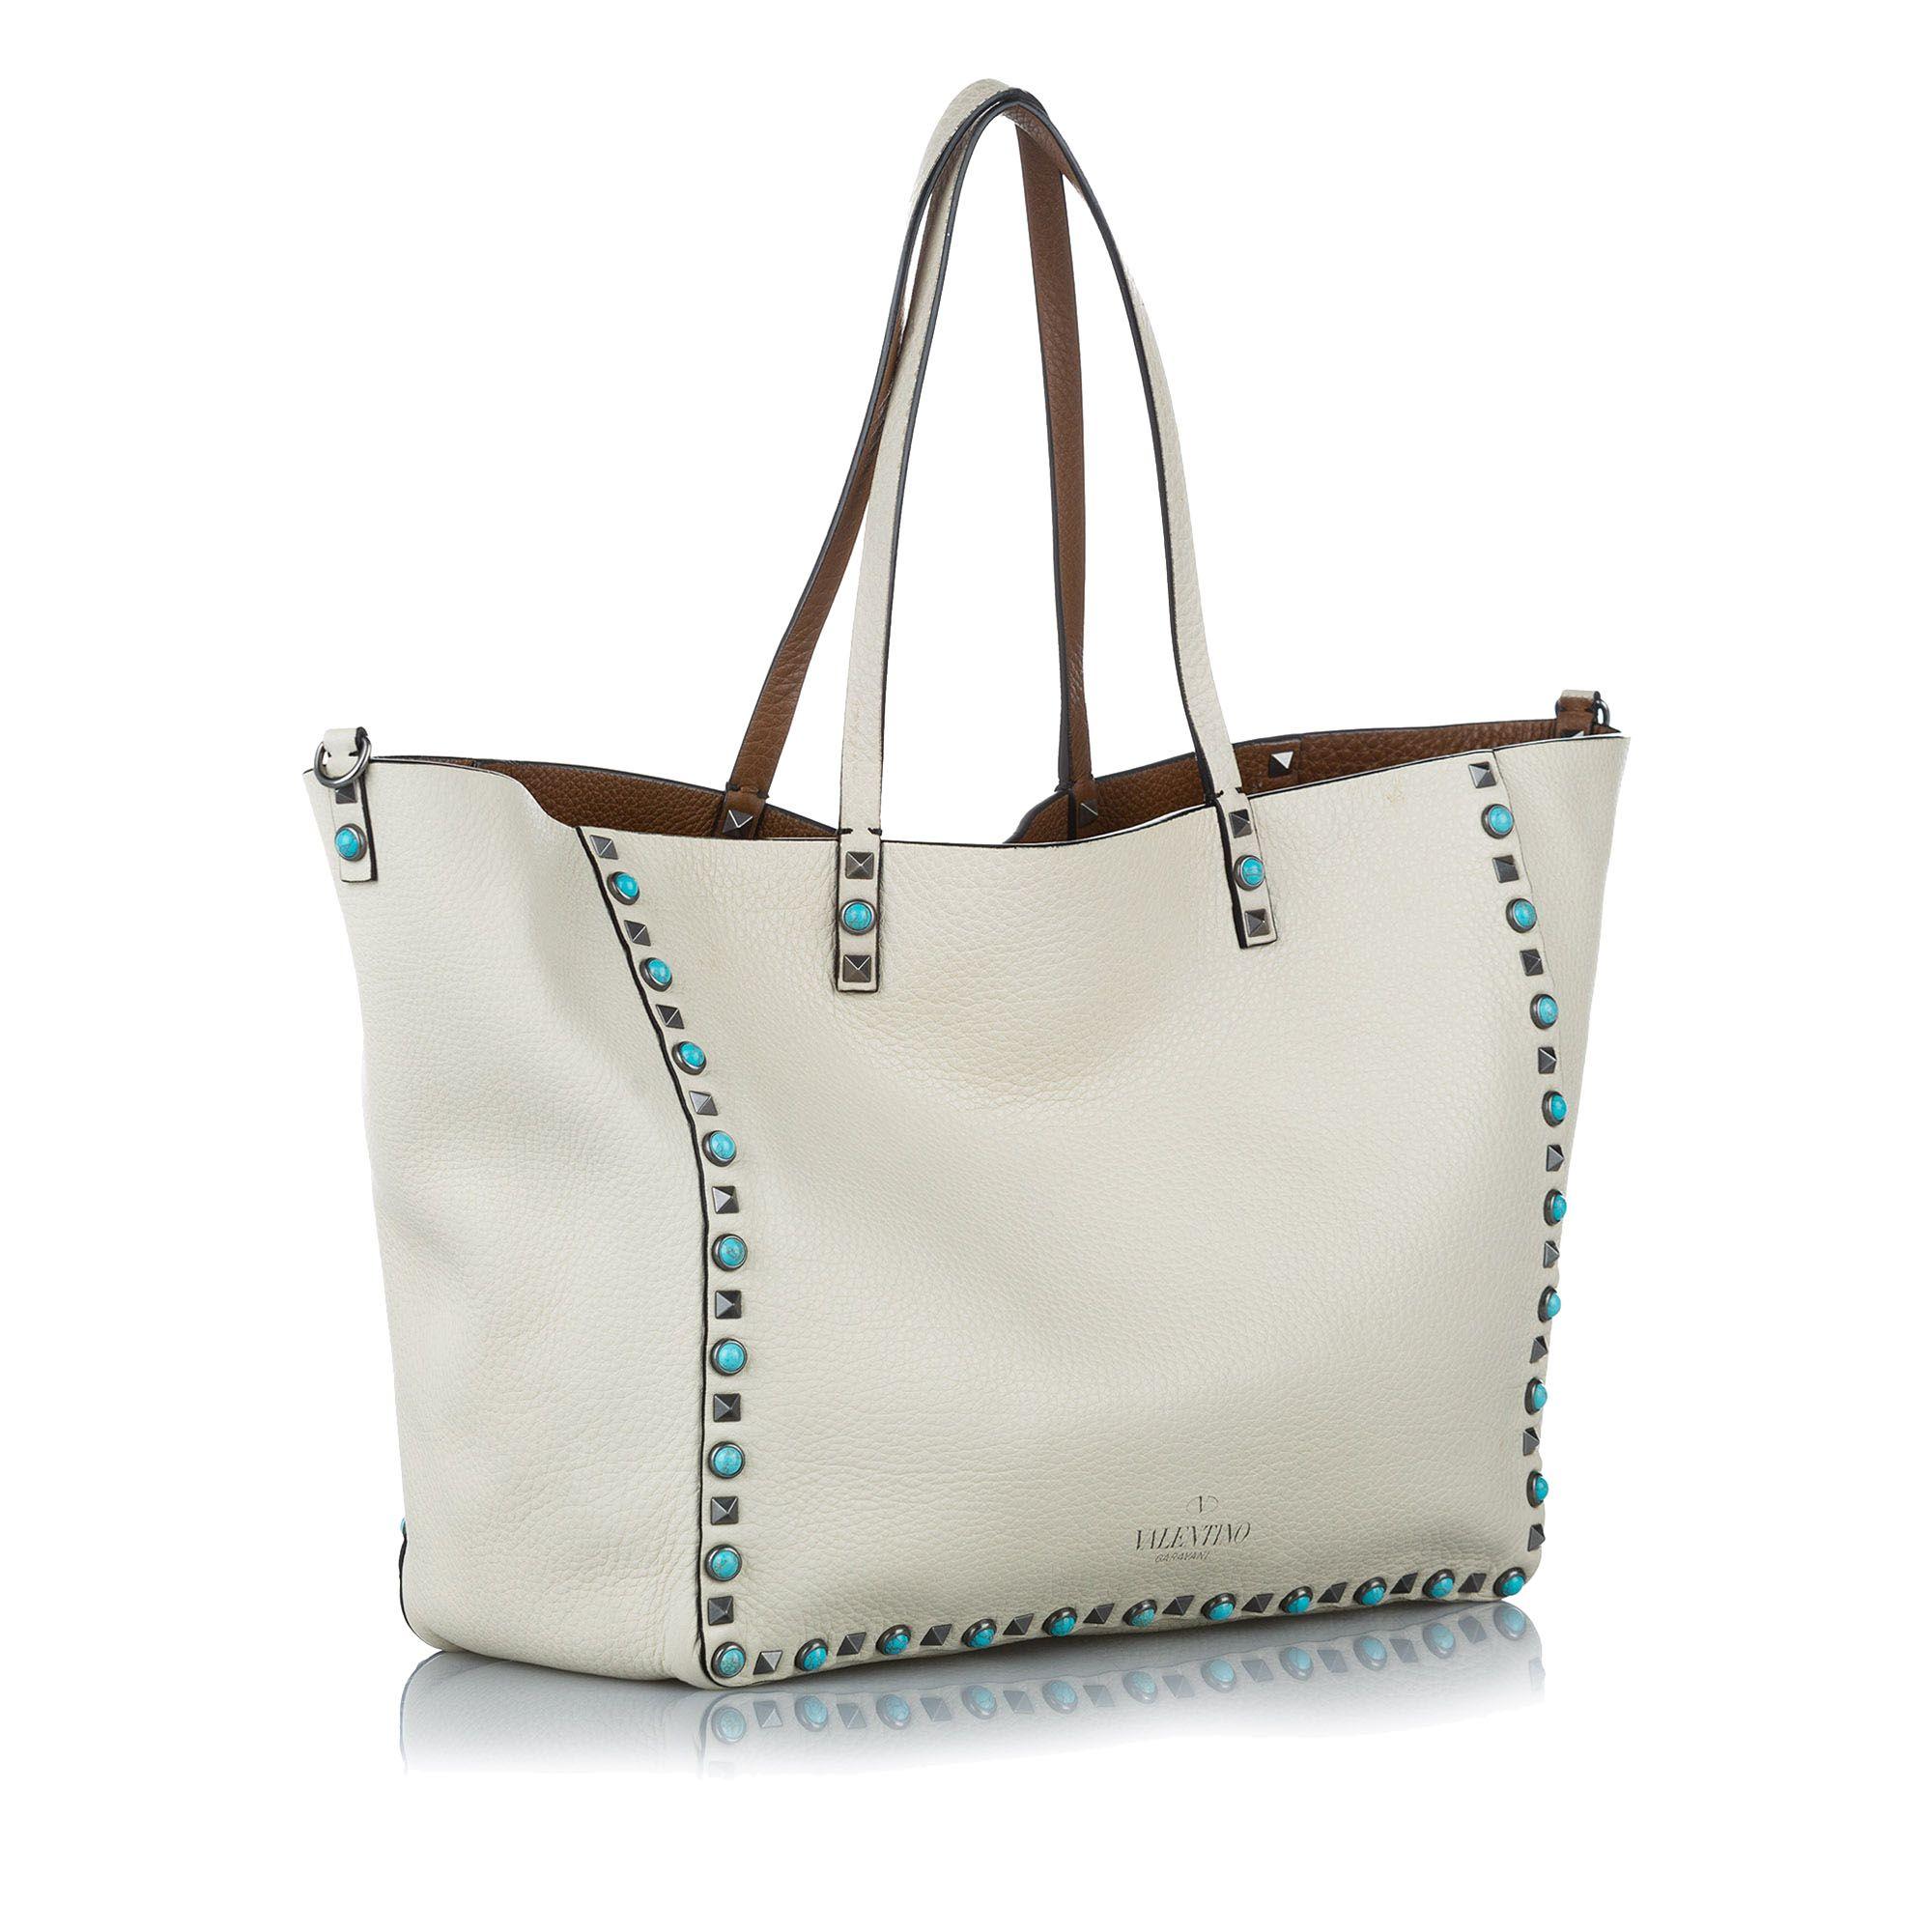 Vintage Valentino Rockstud Leather Tote Bag White